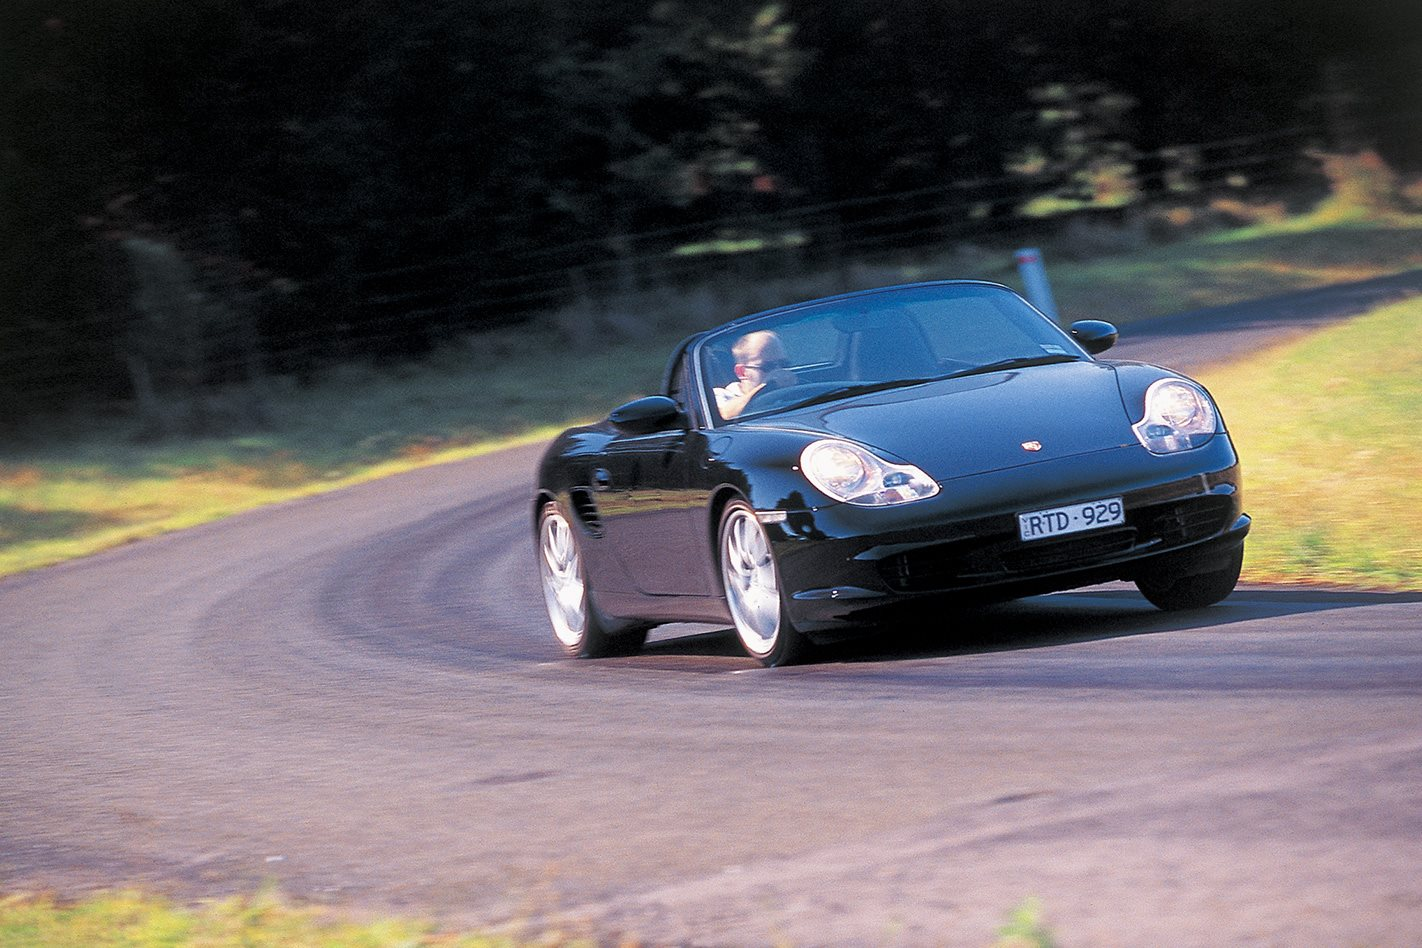 2003 Porsche Boxster S traction control